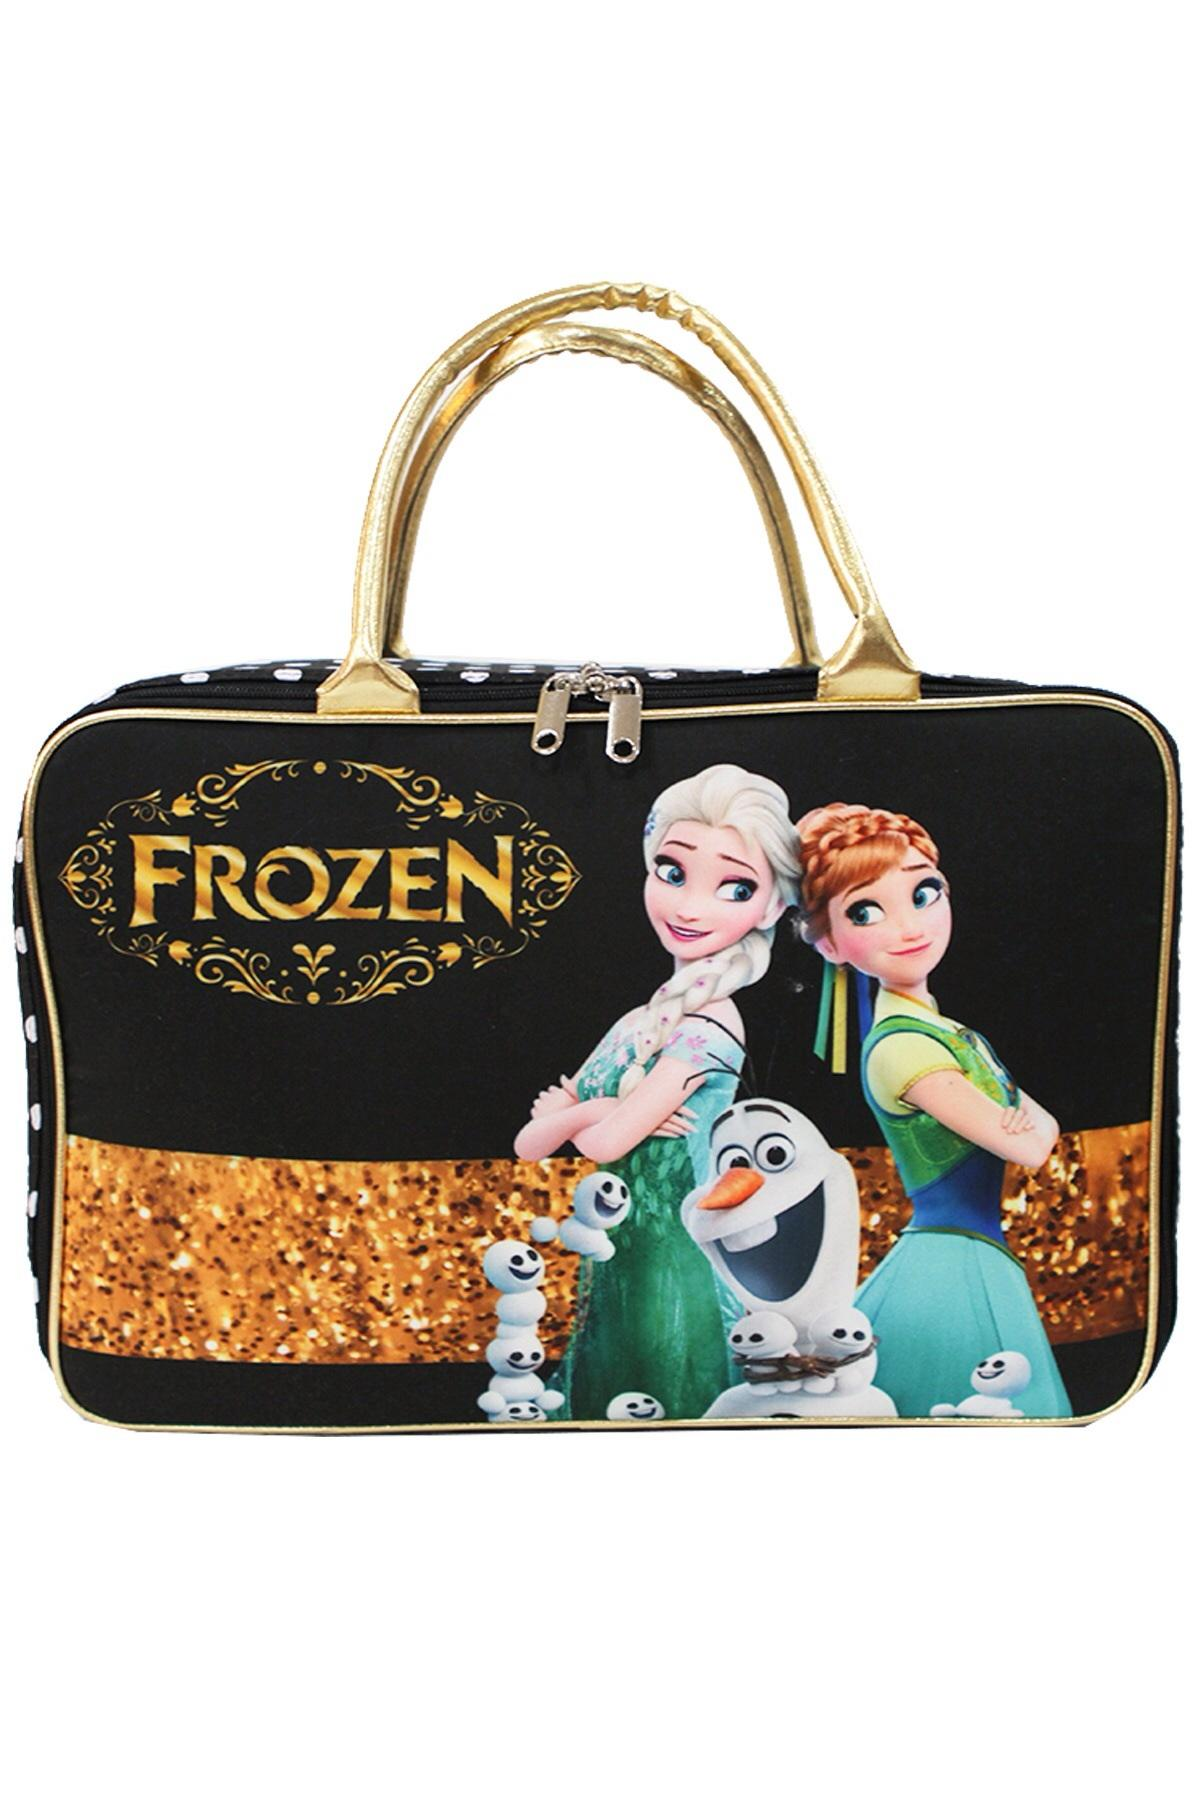 Tas Travel Bag Koper Kanvas Renang Kotak Anak Dewasa Frozen Fever Elsa